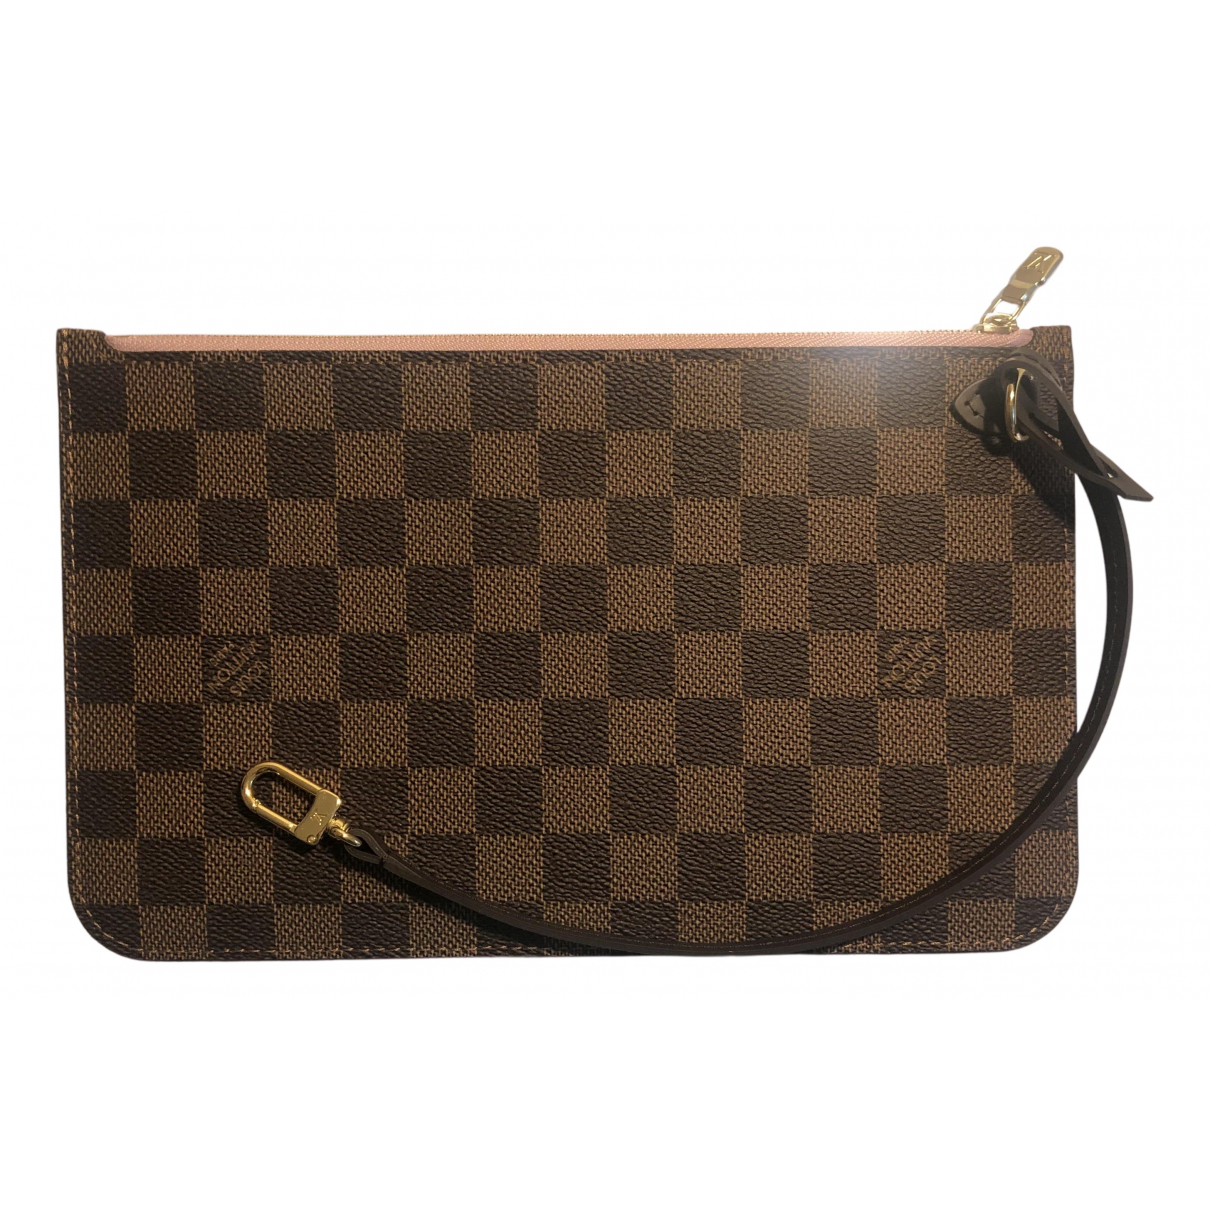 Louis Vuitton Neverfull Brown Cloth Clutch bag for Women N